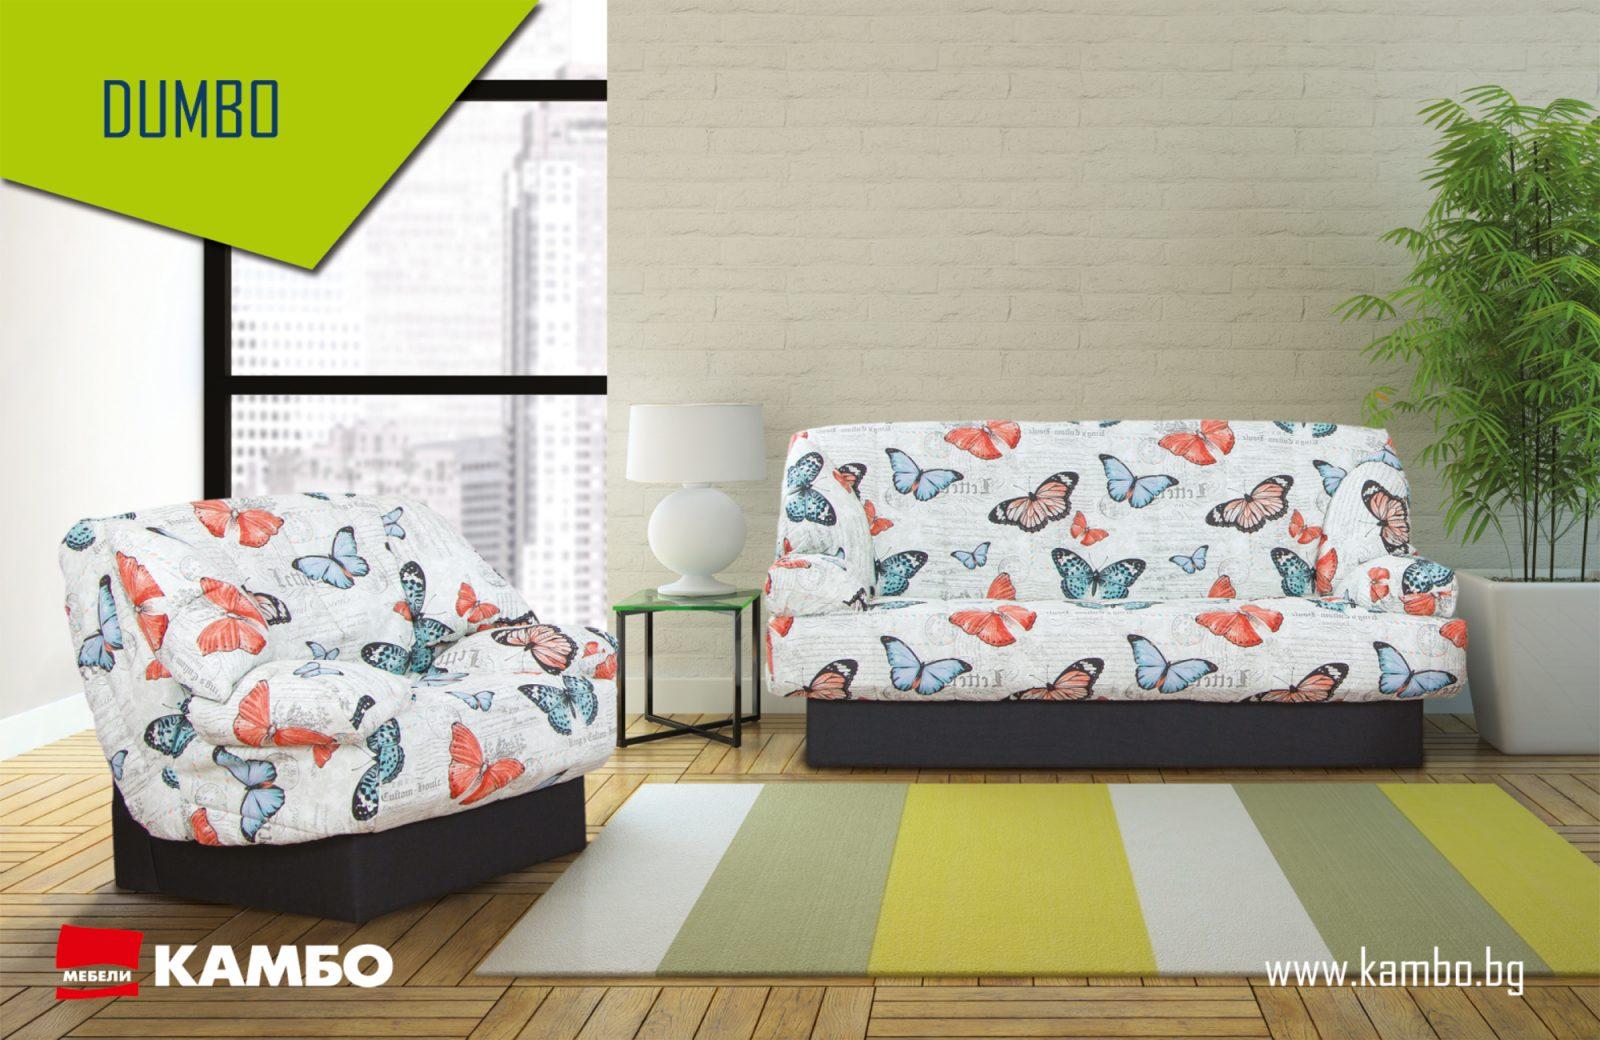 Folding sofa Dumbo